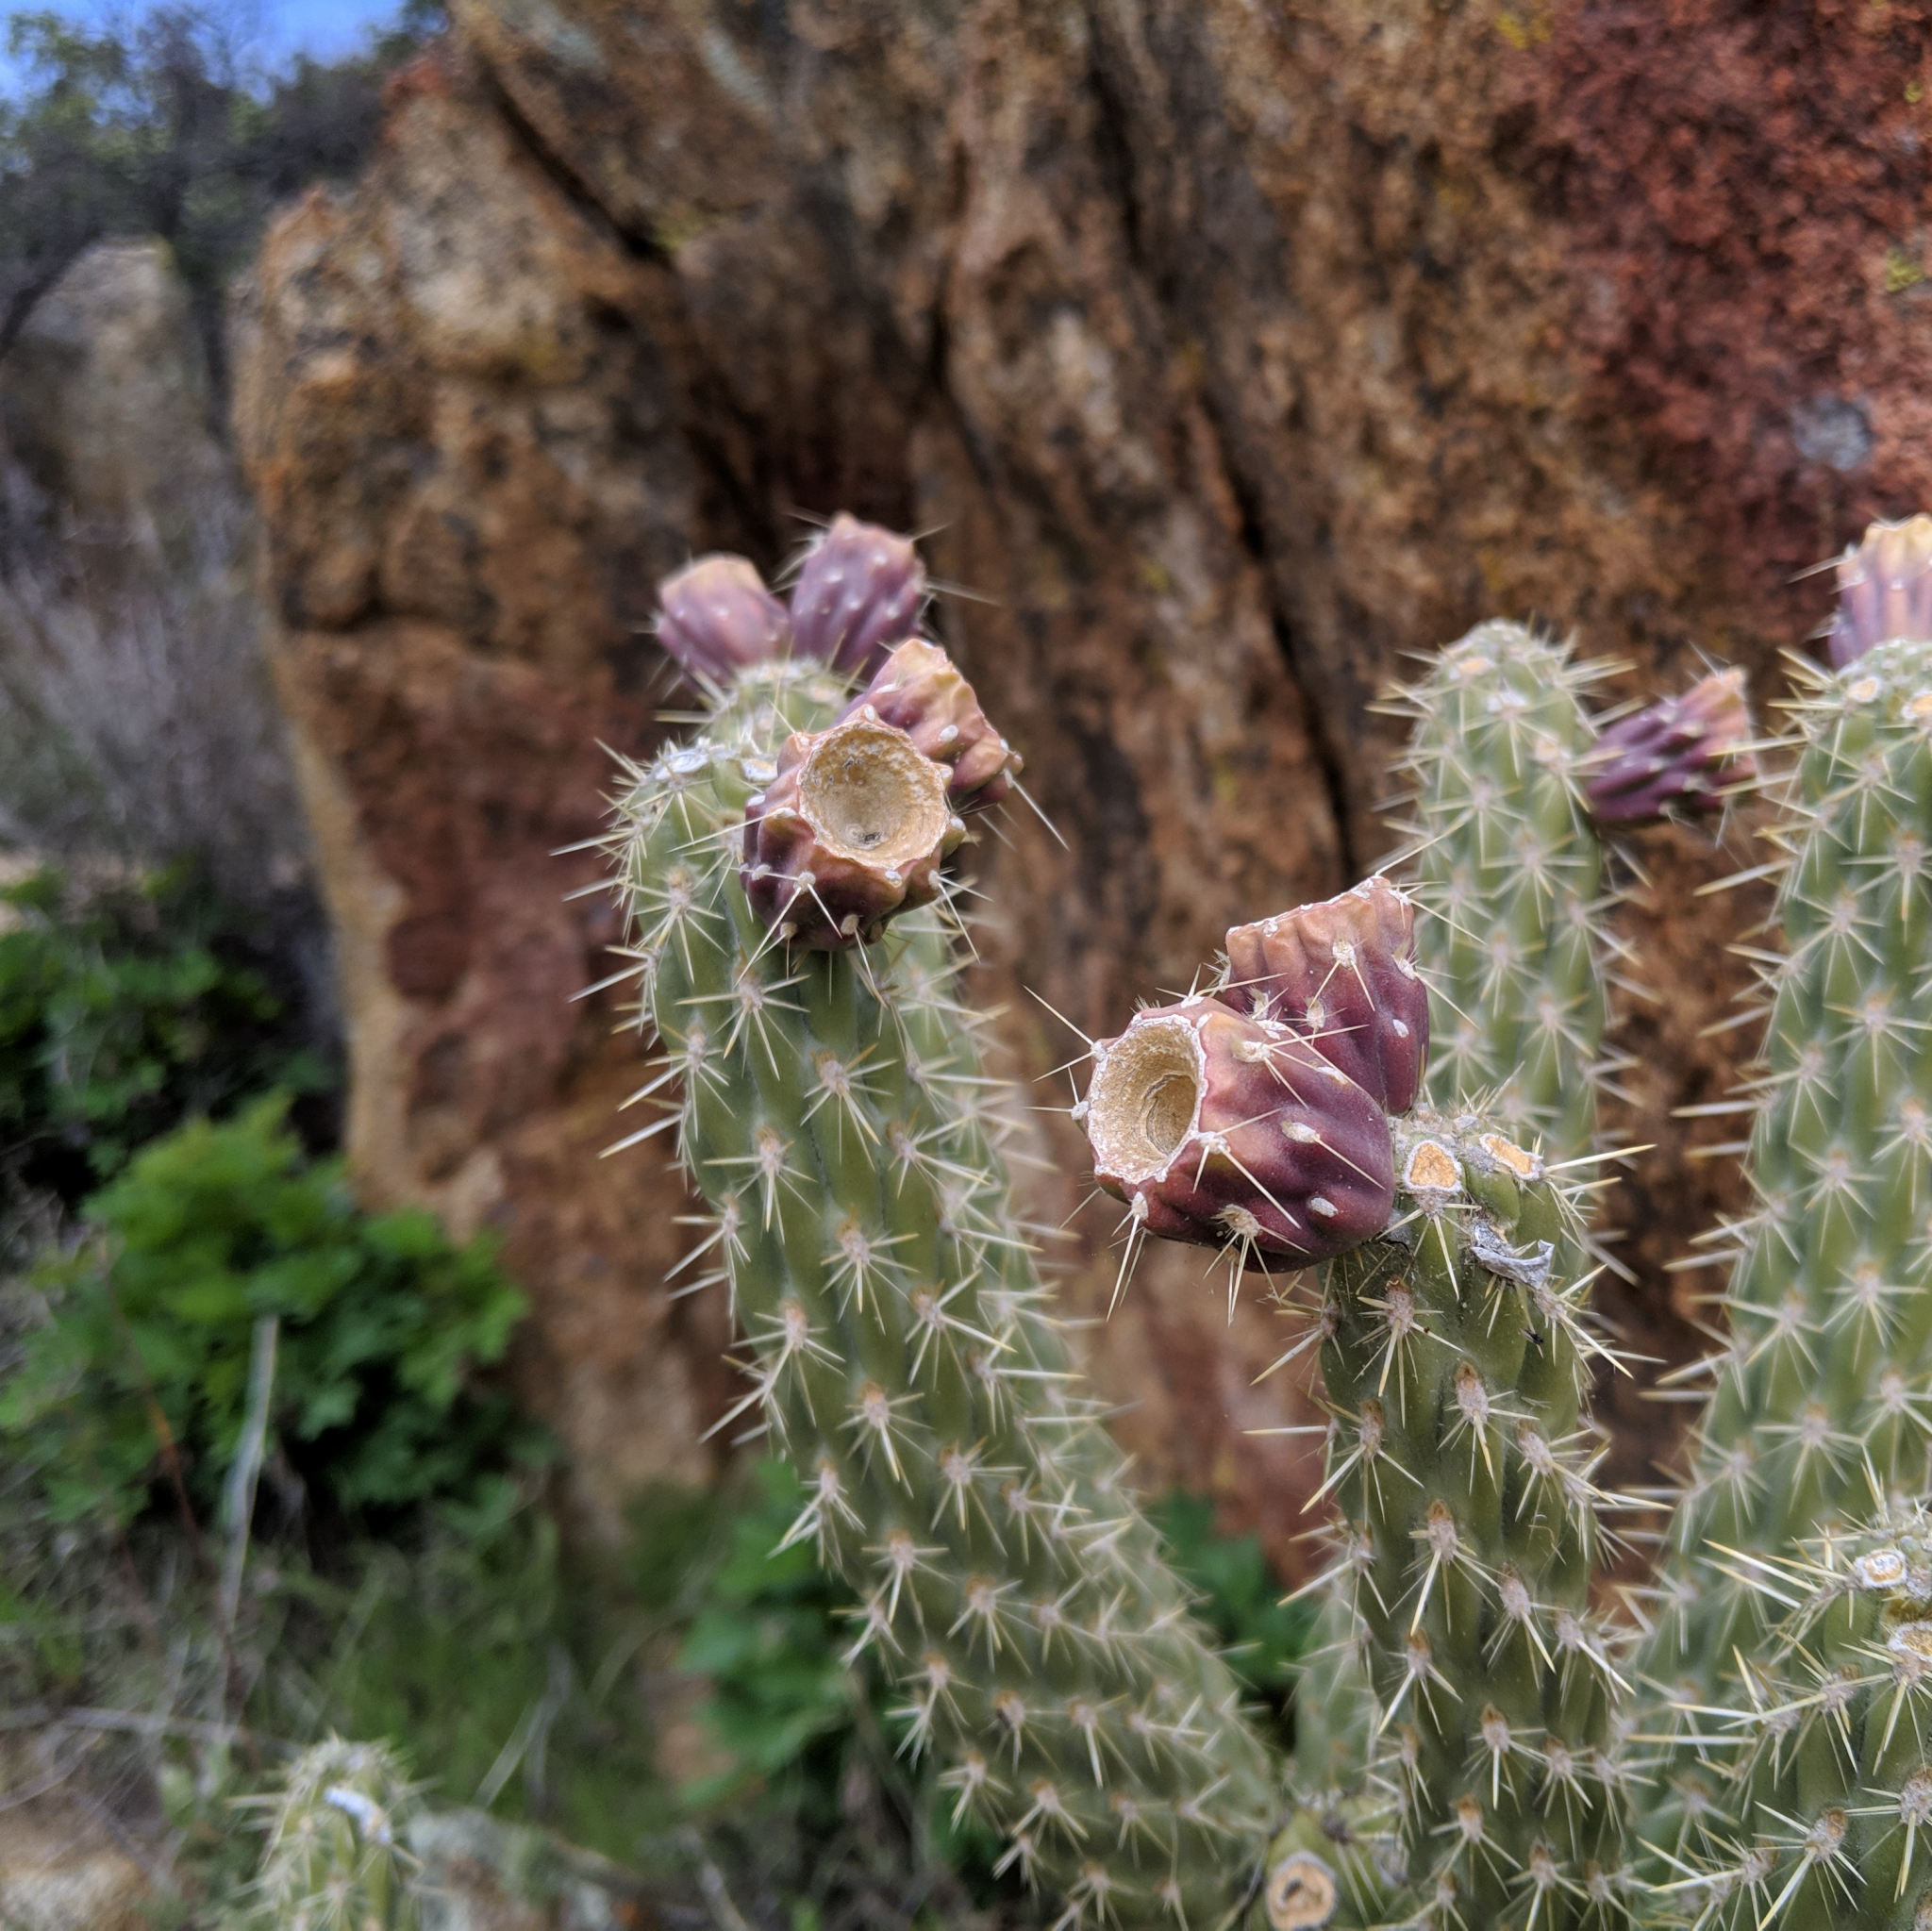 Un cactus en fleurs • A blooming cactus